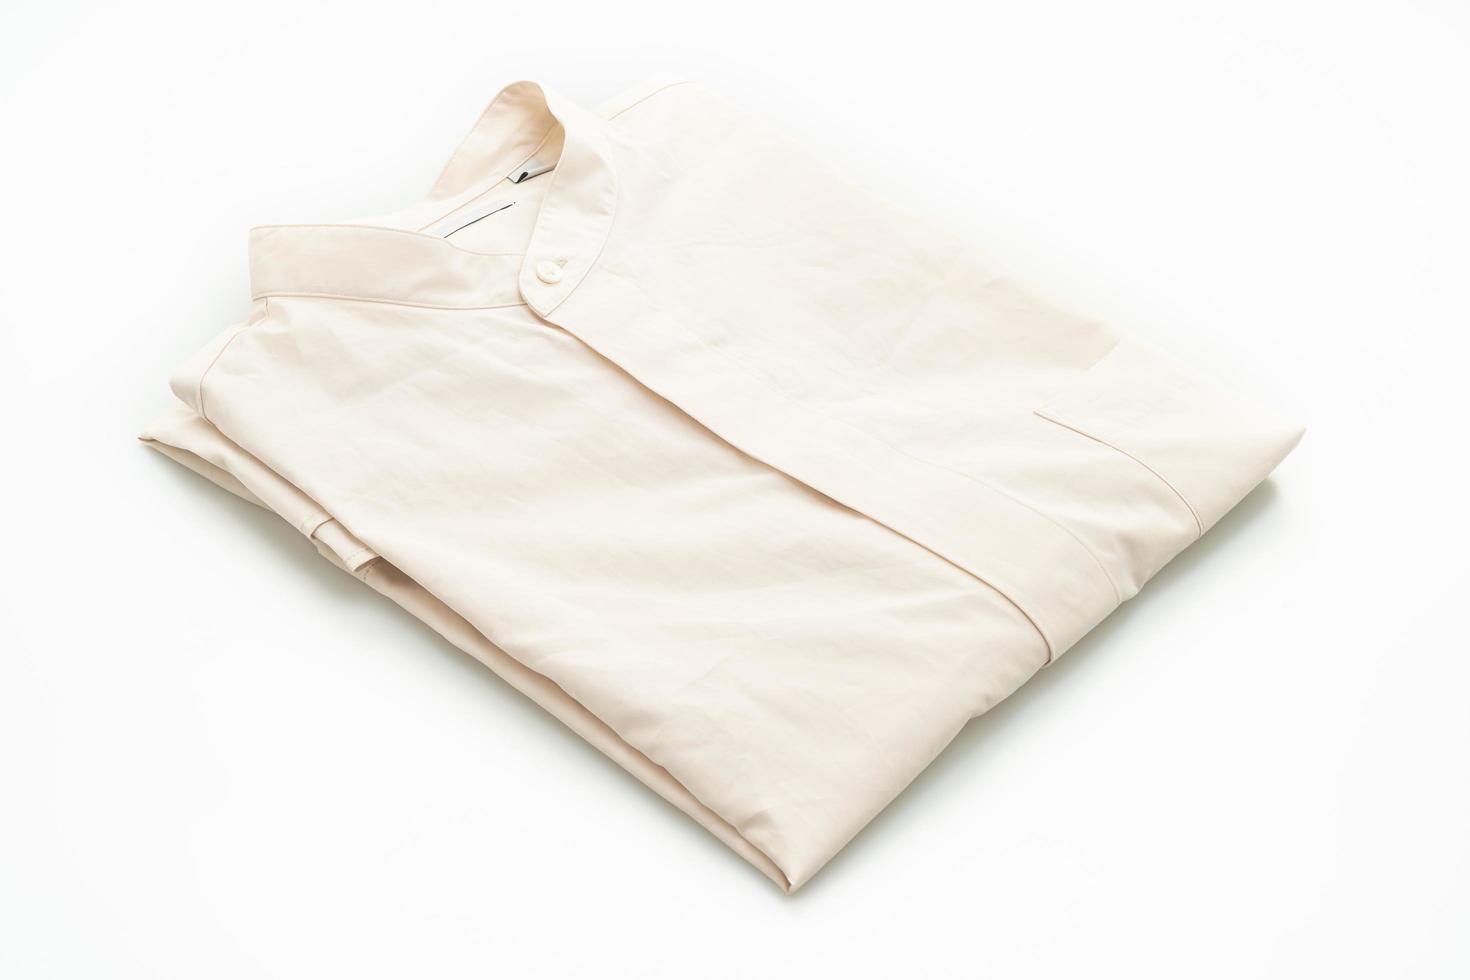 beige skjorta vikt isolerad på vit bakgrund foto